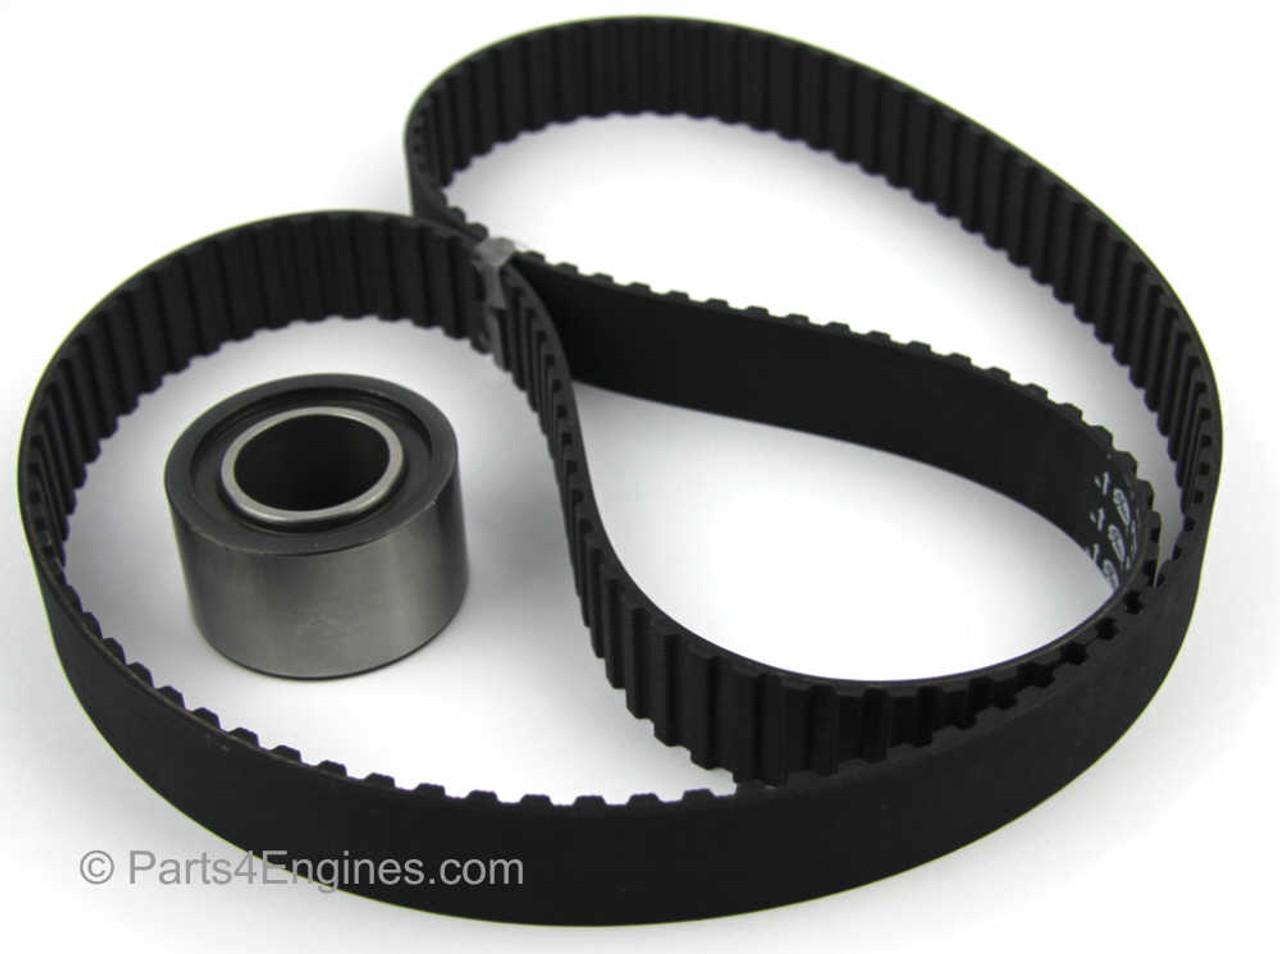 Perkins Prima M60 Timing Belt kit - parts4engines.com